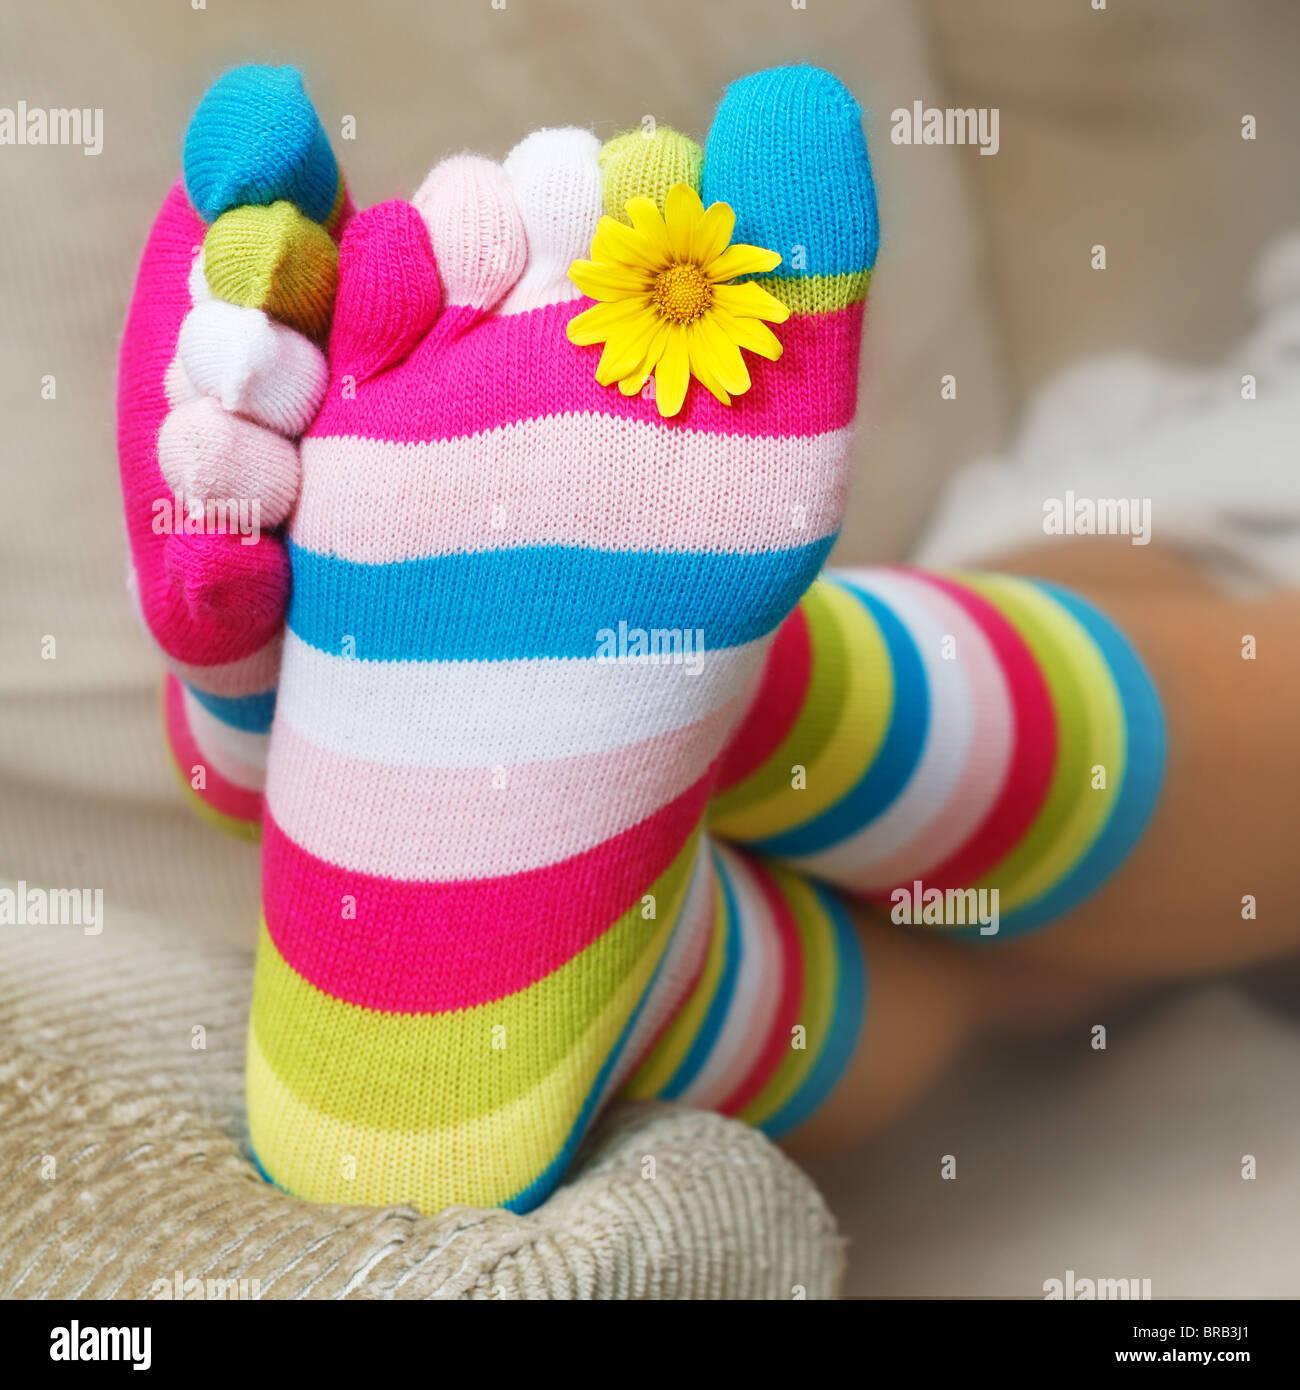 Bright socks and a daisy on the sofa - Stock Image